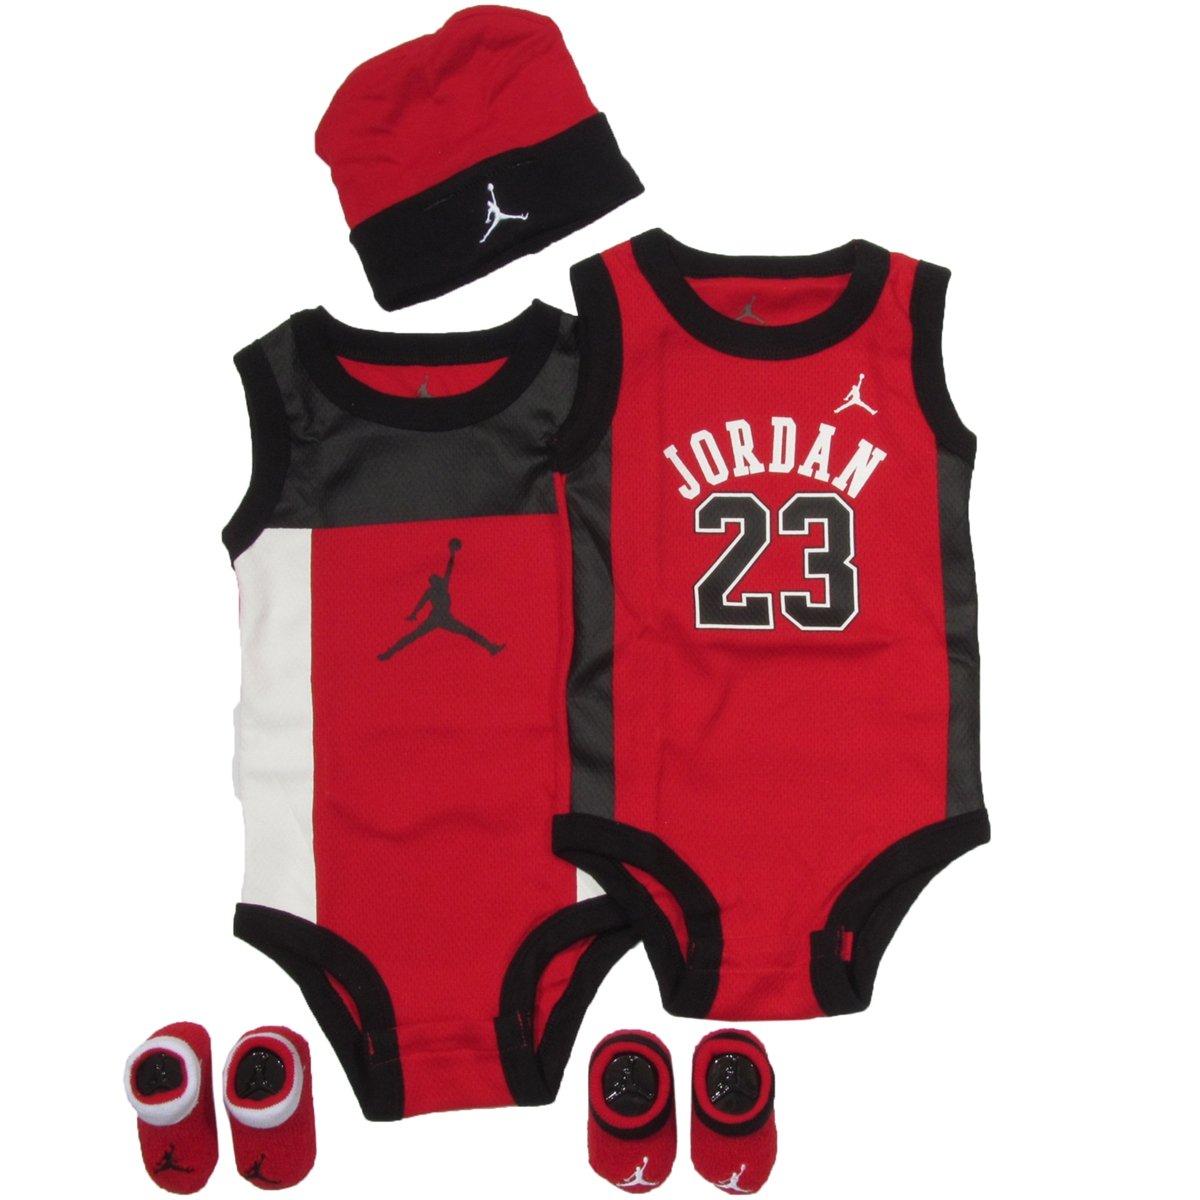 Jordan Jumpman 3 Piece Creeper Set - Boys' Infant $ $ Jordan Wing Tunic & Leggings Set - Girls' Infant $ $ Jordan Cement Print Hat and Bootie Set - Boys' Infant $ $